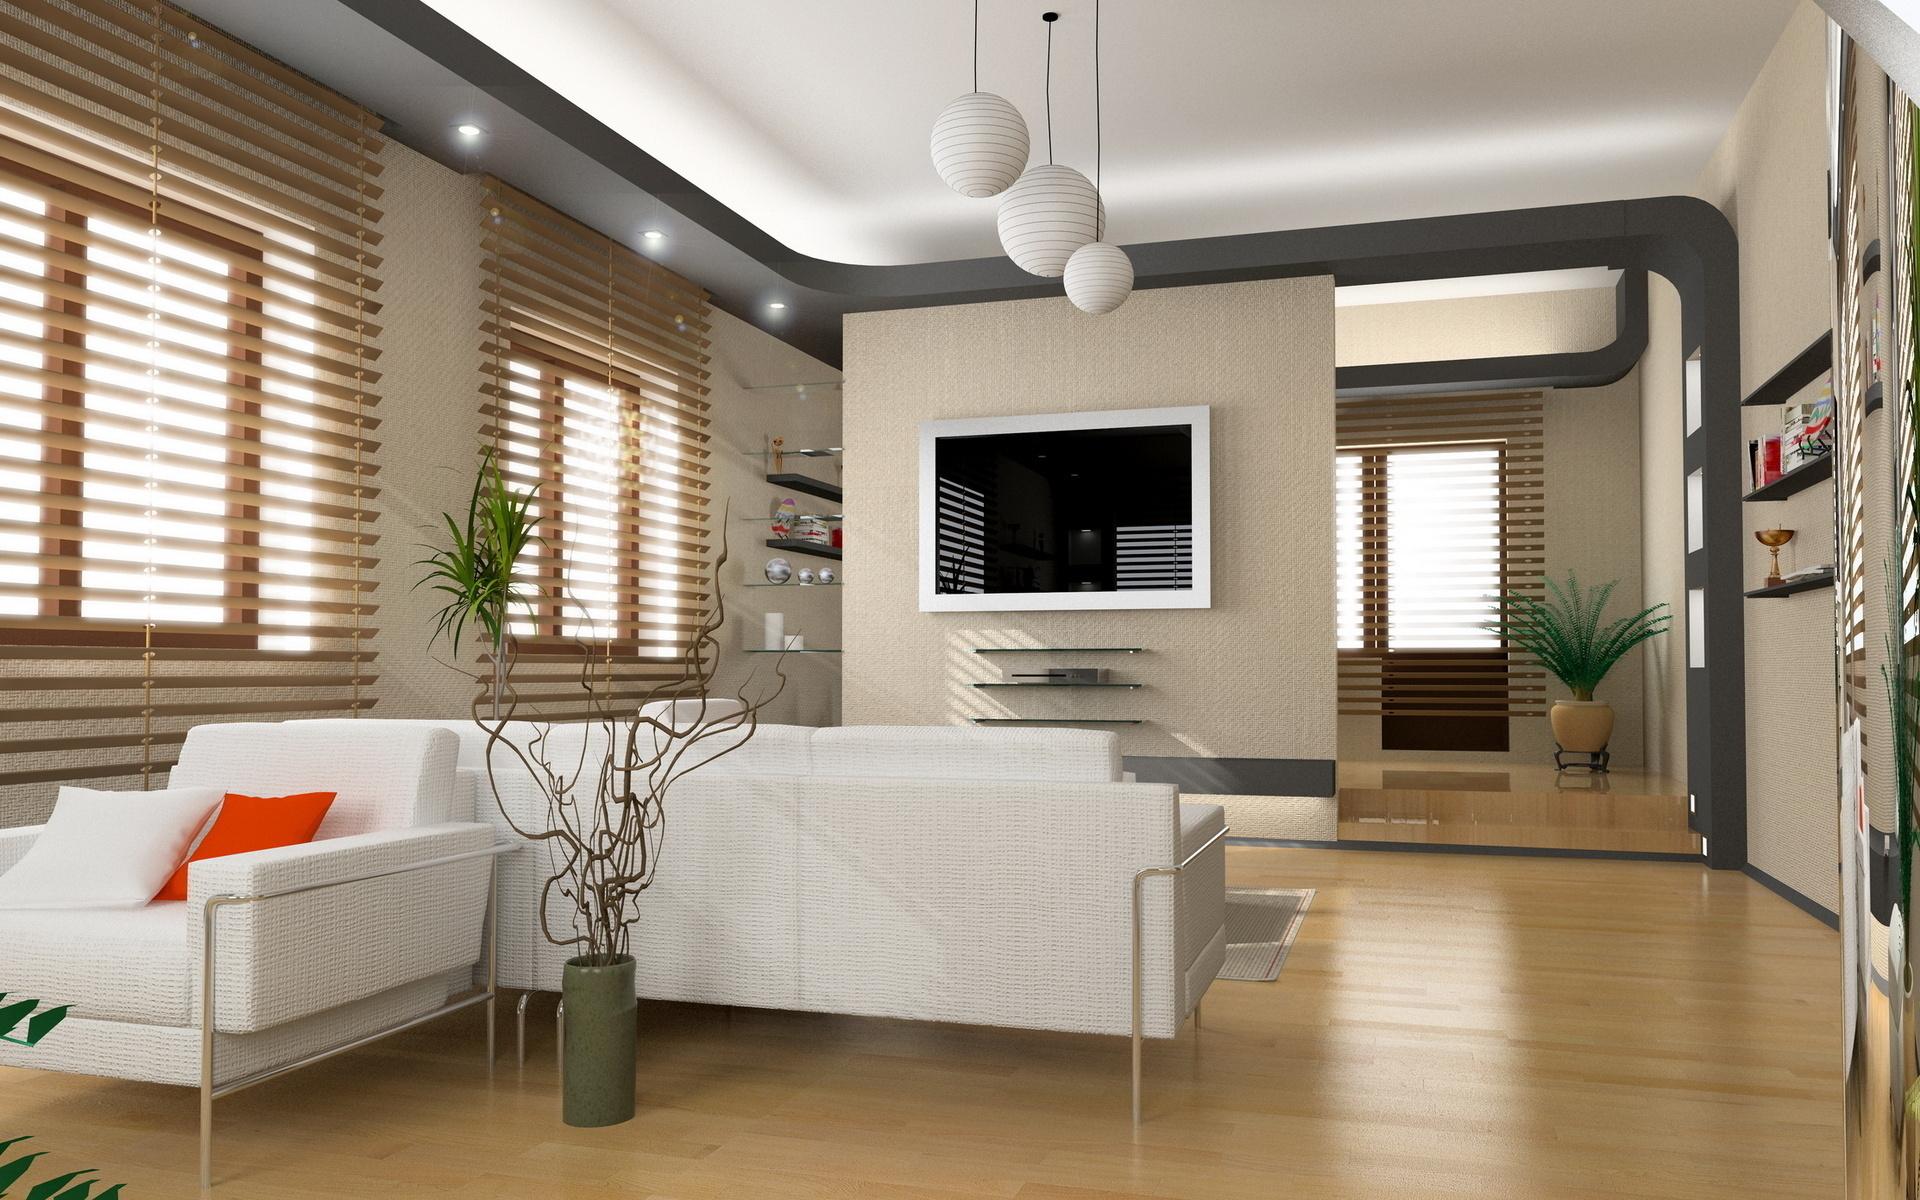 Красивые интерьеры квартир своими руками